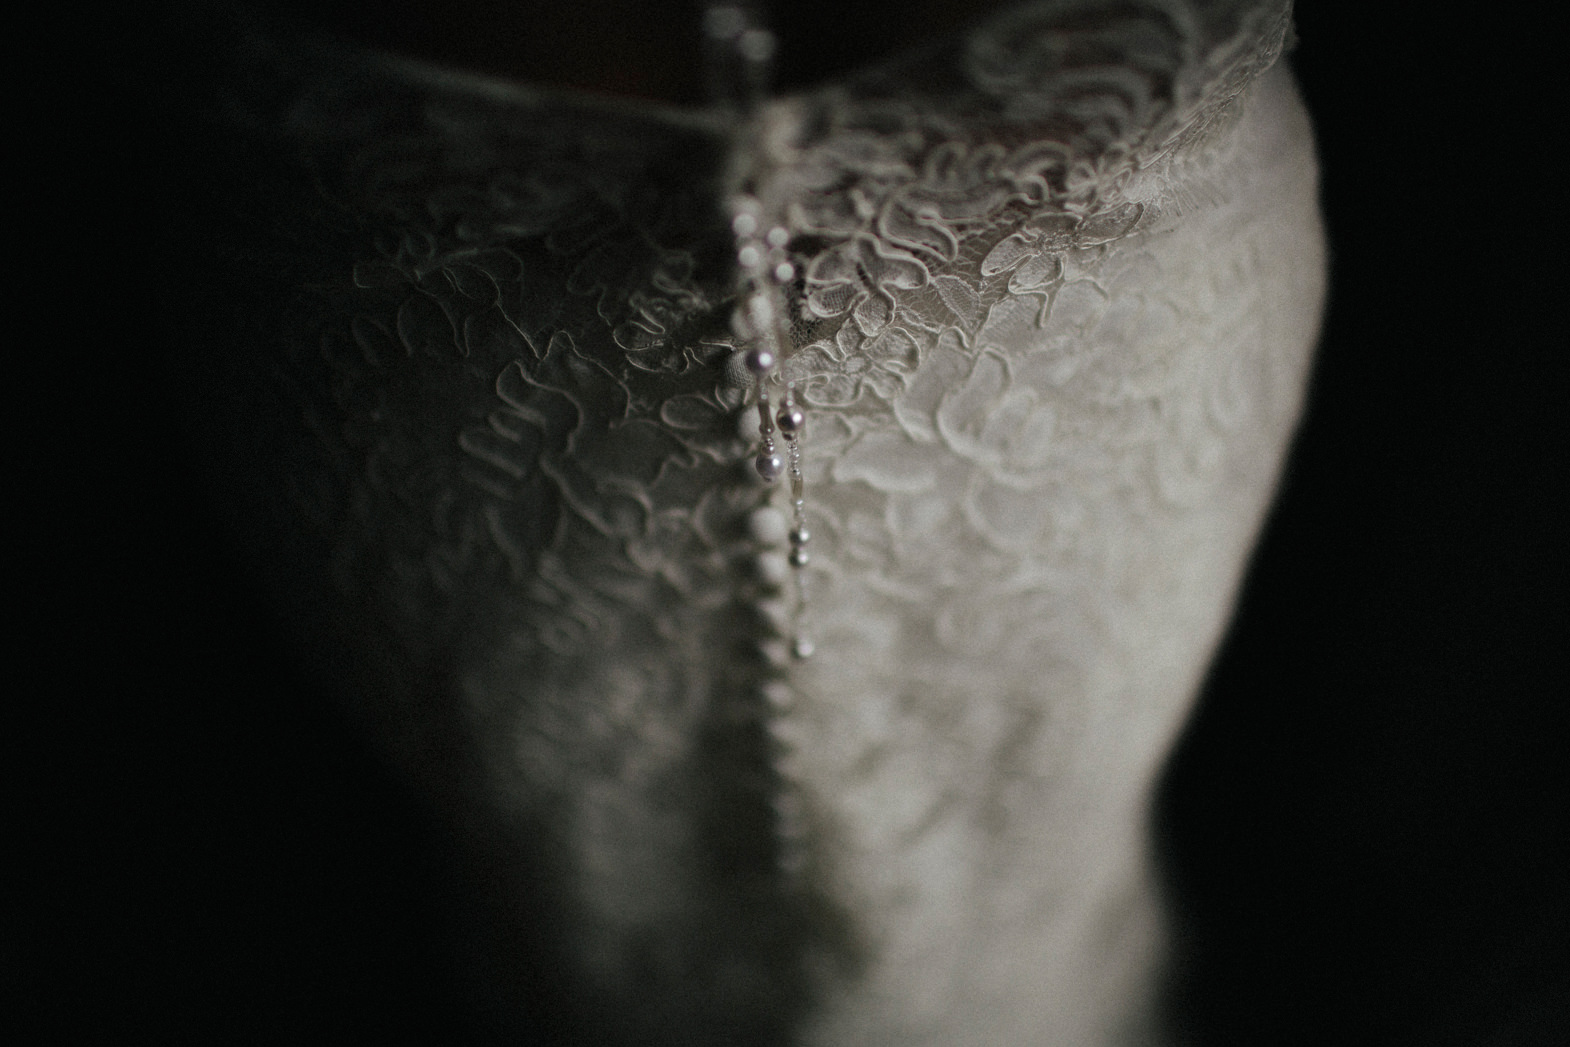 WEDDING PHOTOGRAPHy AT LOWER BARN (61).jpg